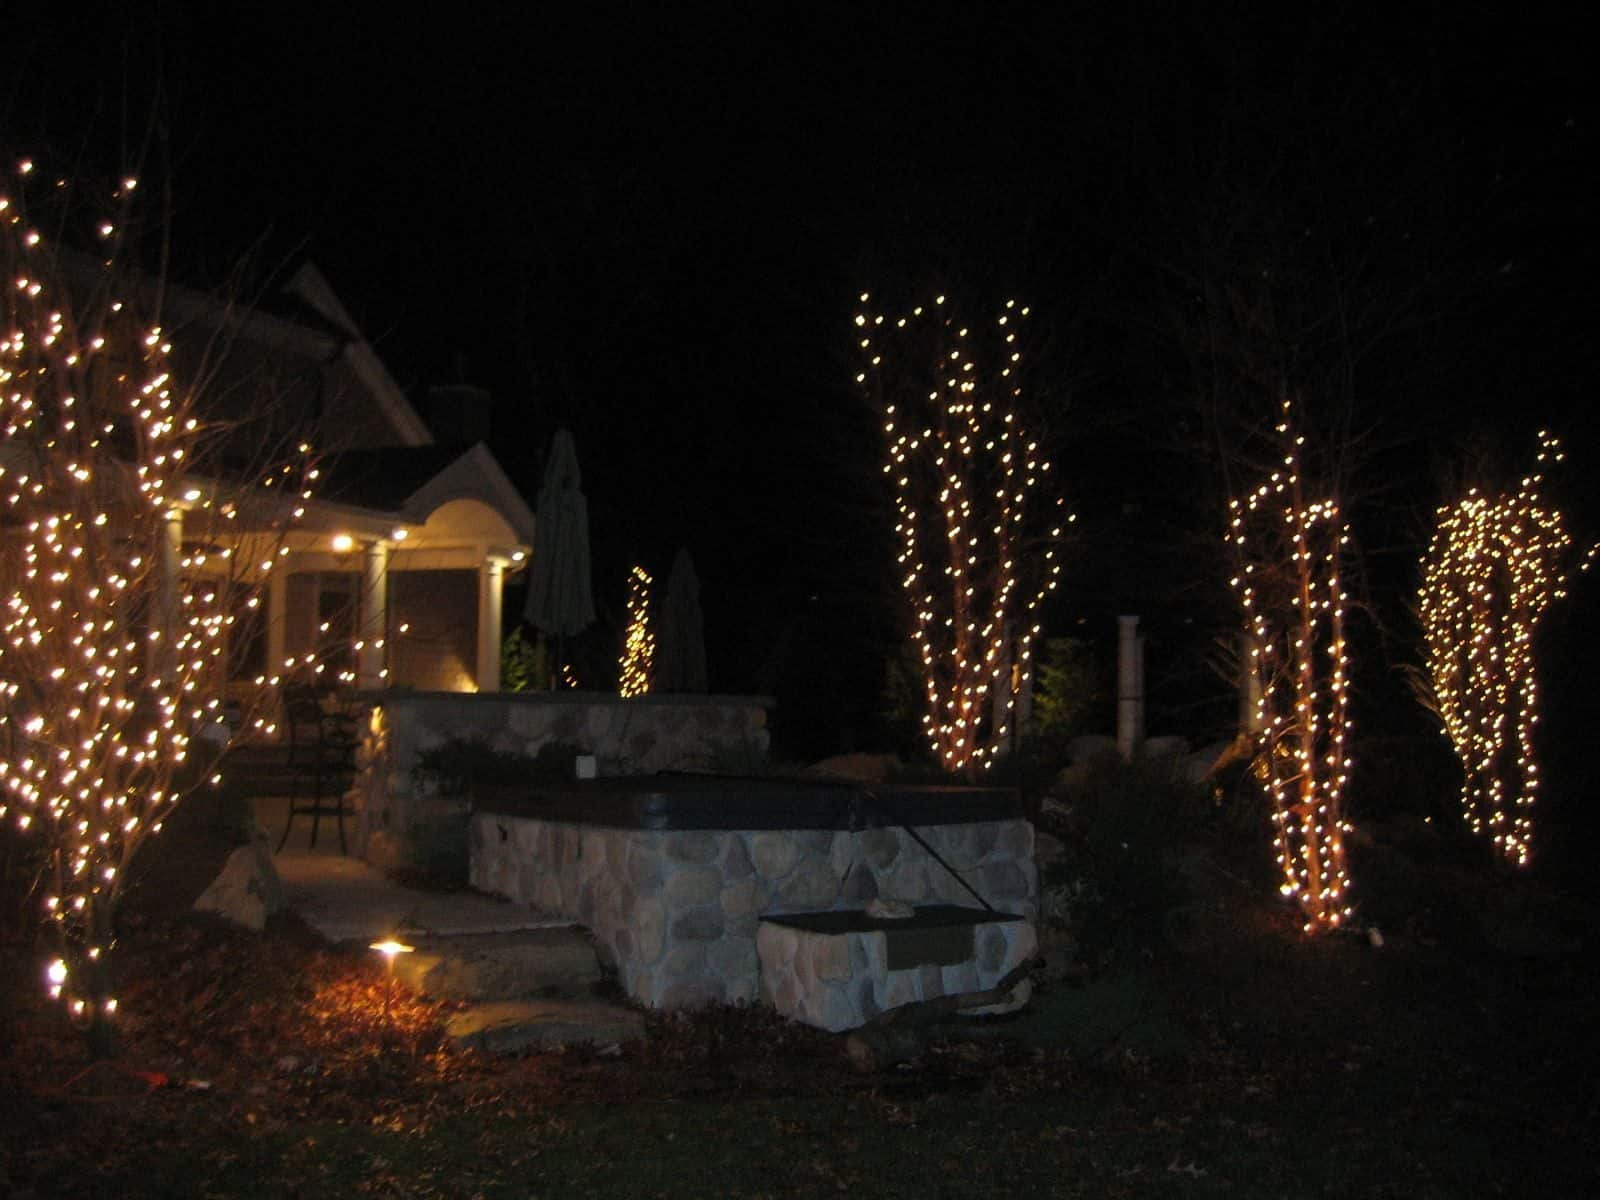 Outdoor Tree Lights in the Hamptons, NY